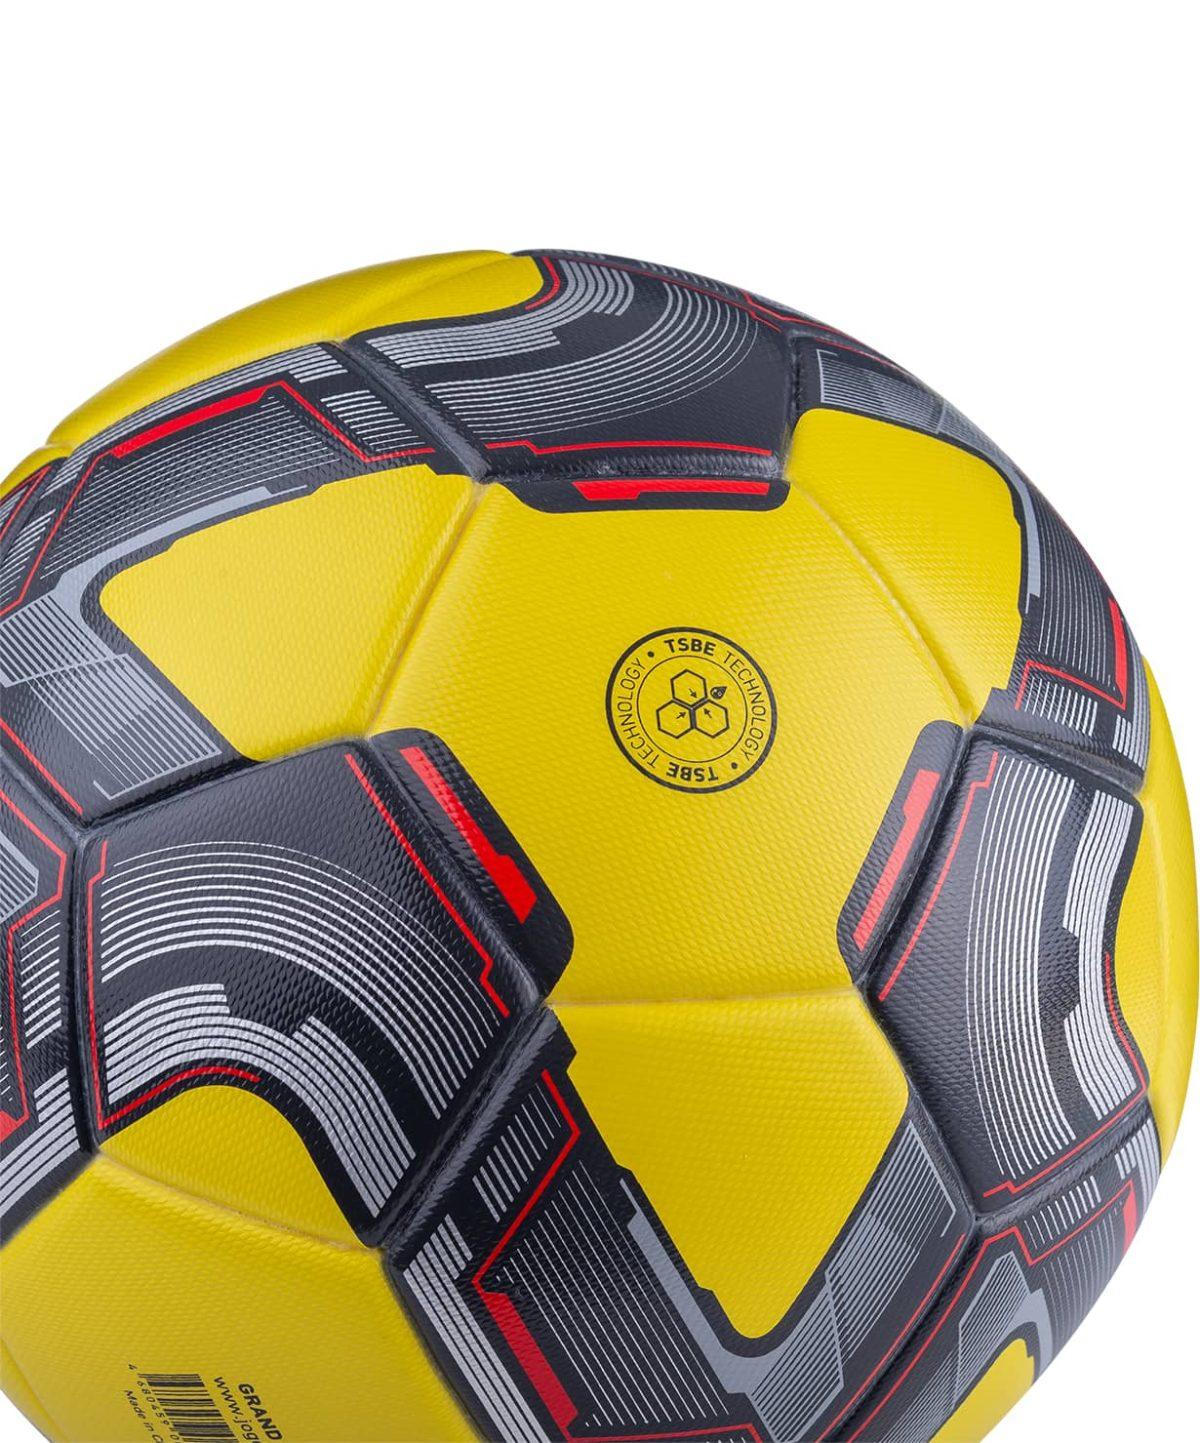 JOGEL Grand Мяч футбольный  Grand №5 (BC20) - 5